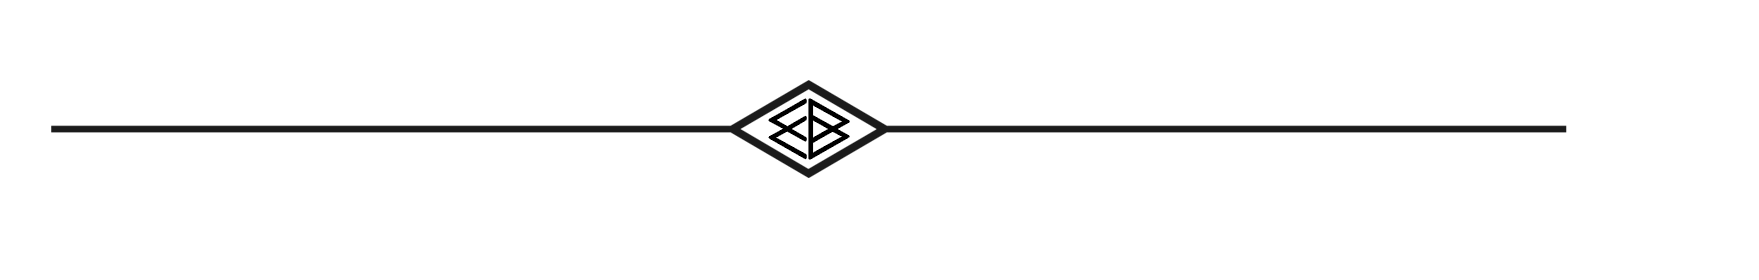 separator2